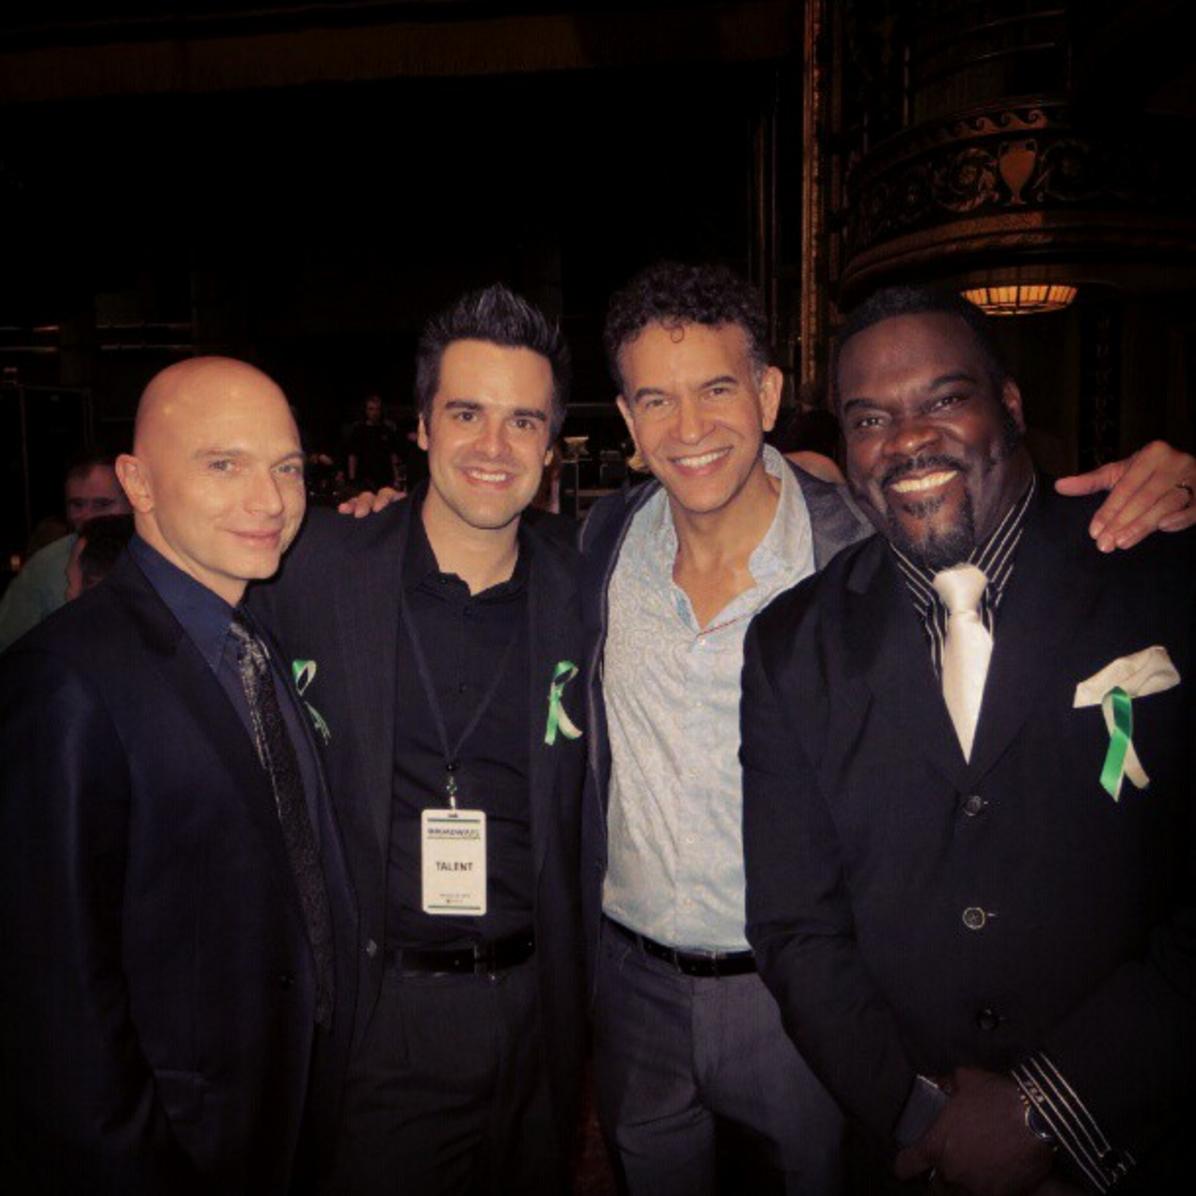 Michael J Moritz Jr with Michael Cervaris, Brian Stokes Mitchell, and Phillip Boykin